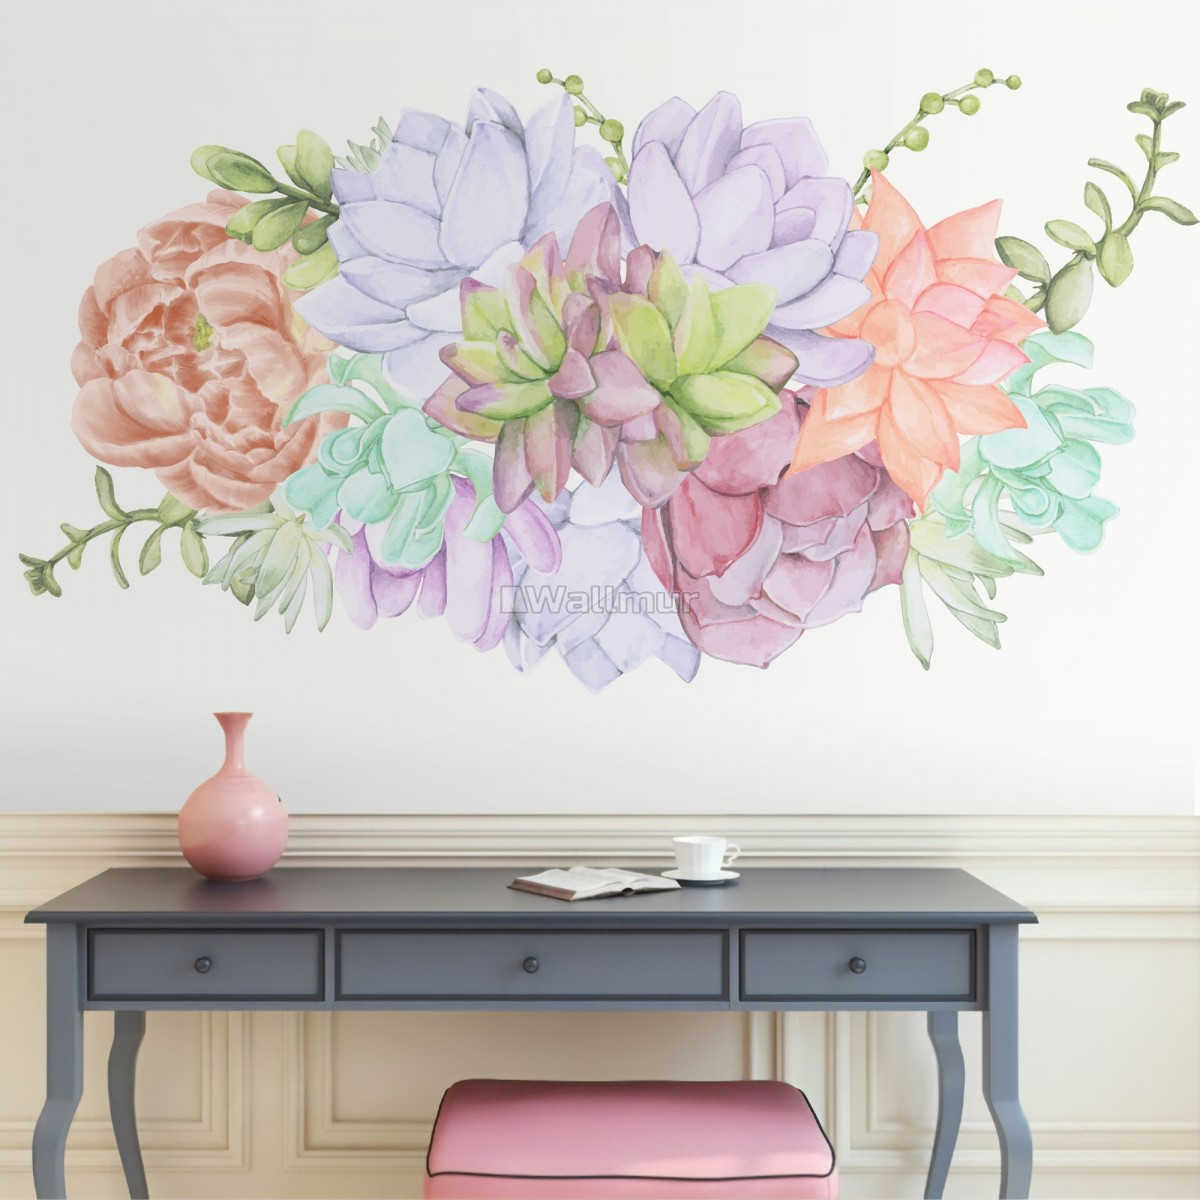 Watercolor Soft Echeveria Cactus Florals Wall Decal Sticker